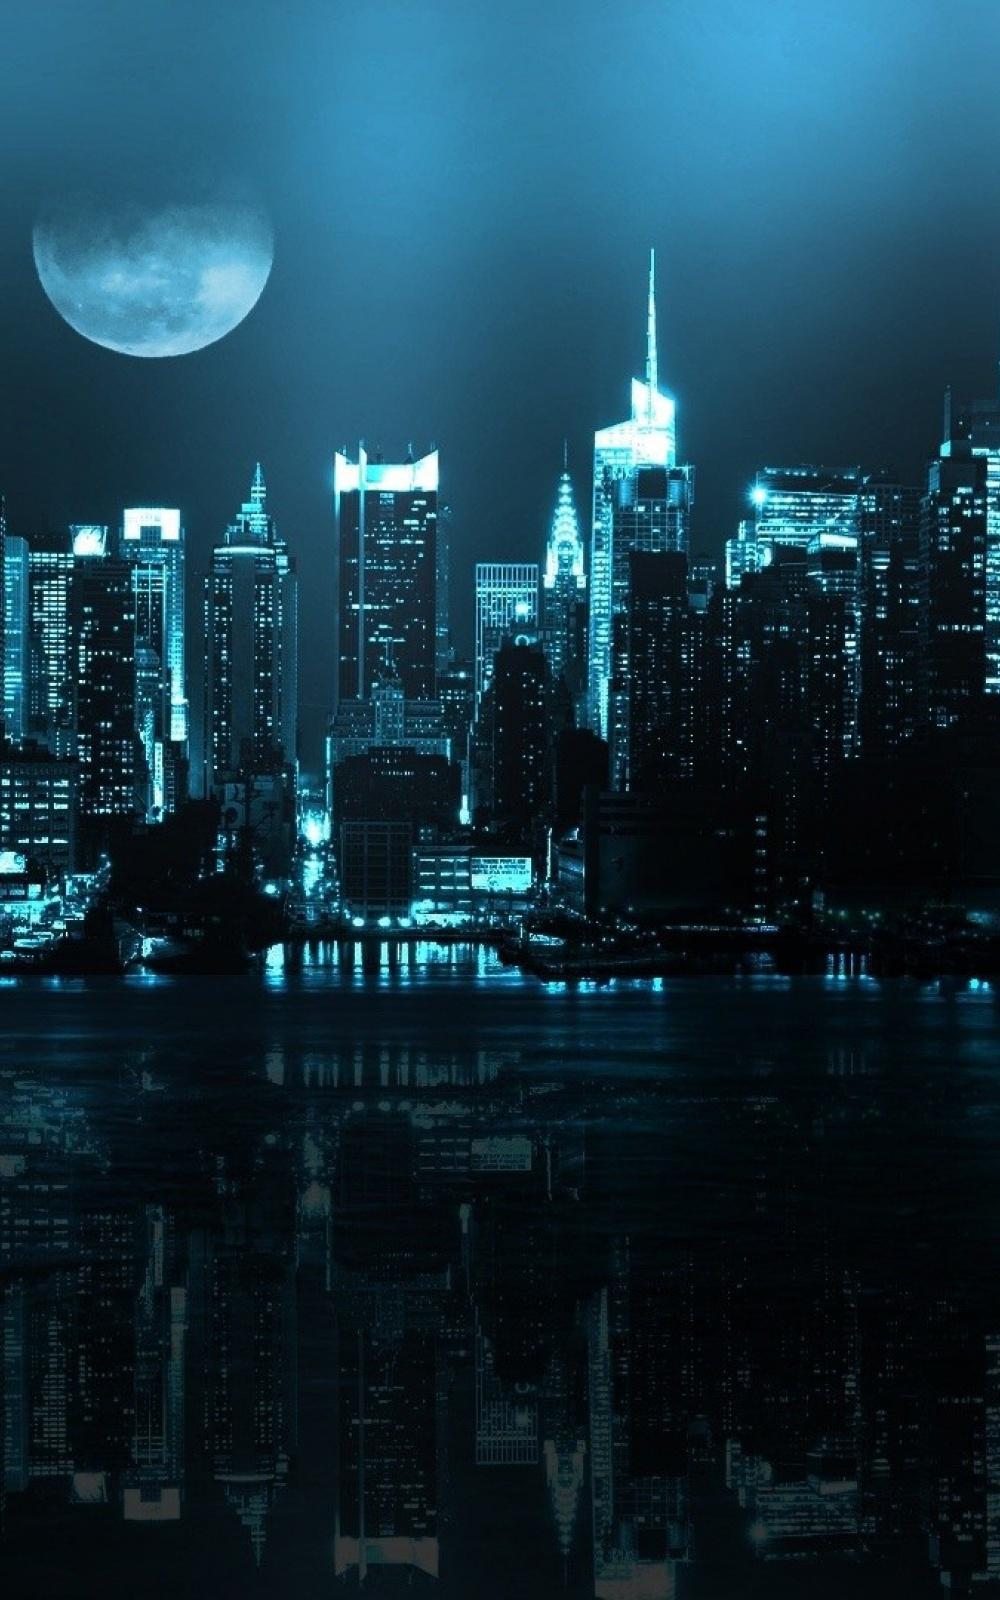 Wallpaper iphone moon - City Skyline Full Moon Iphone 6 Plus Hd Wallpaper Ipod Wallpaper